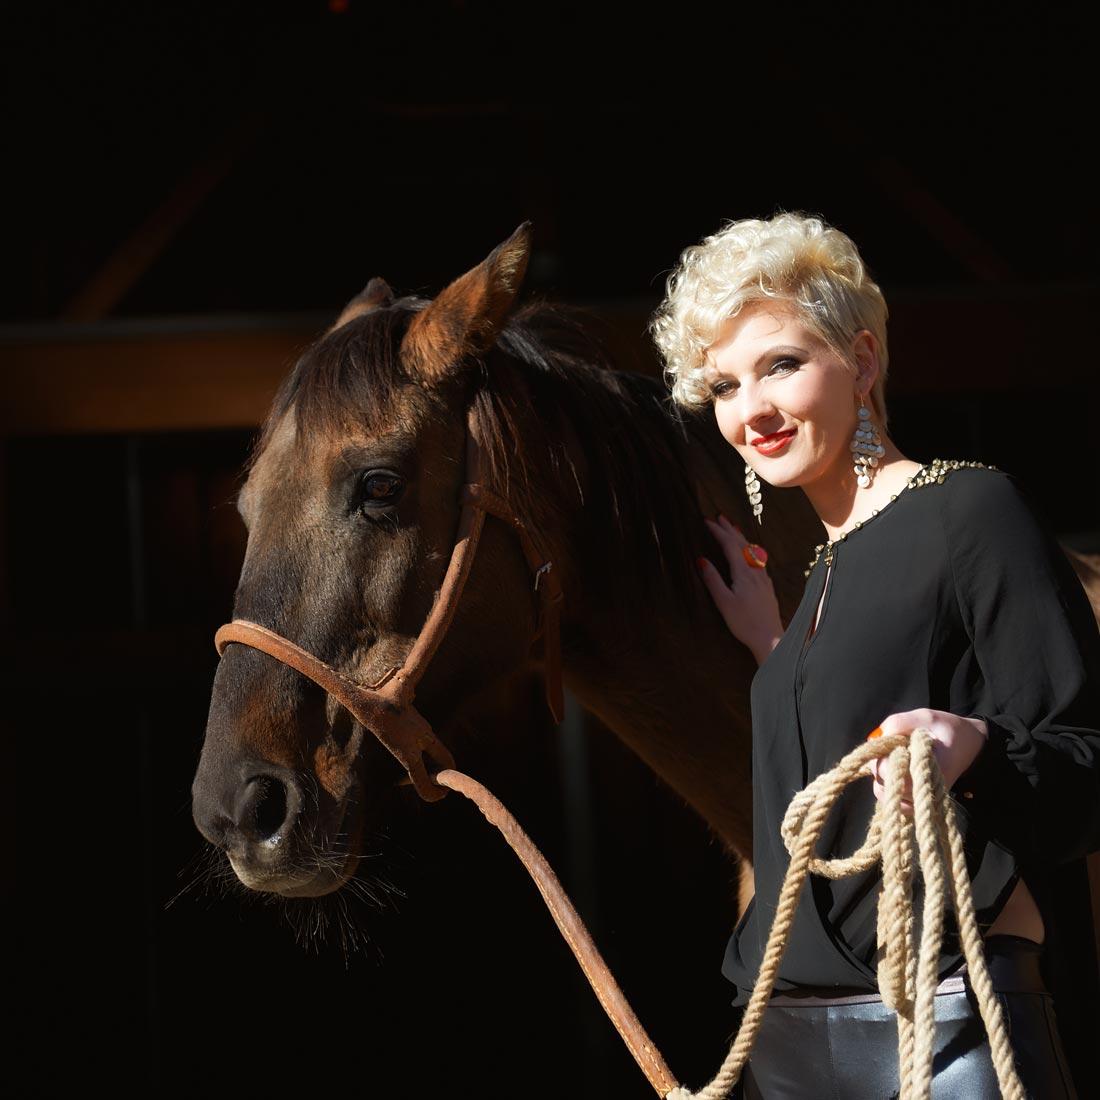 Portraitfotos – Beautyshot Anita mit Pferd